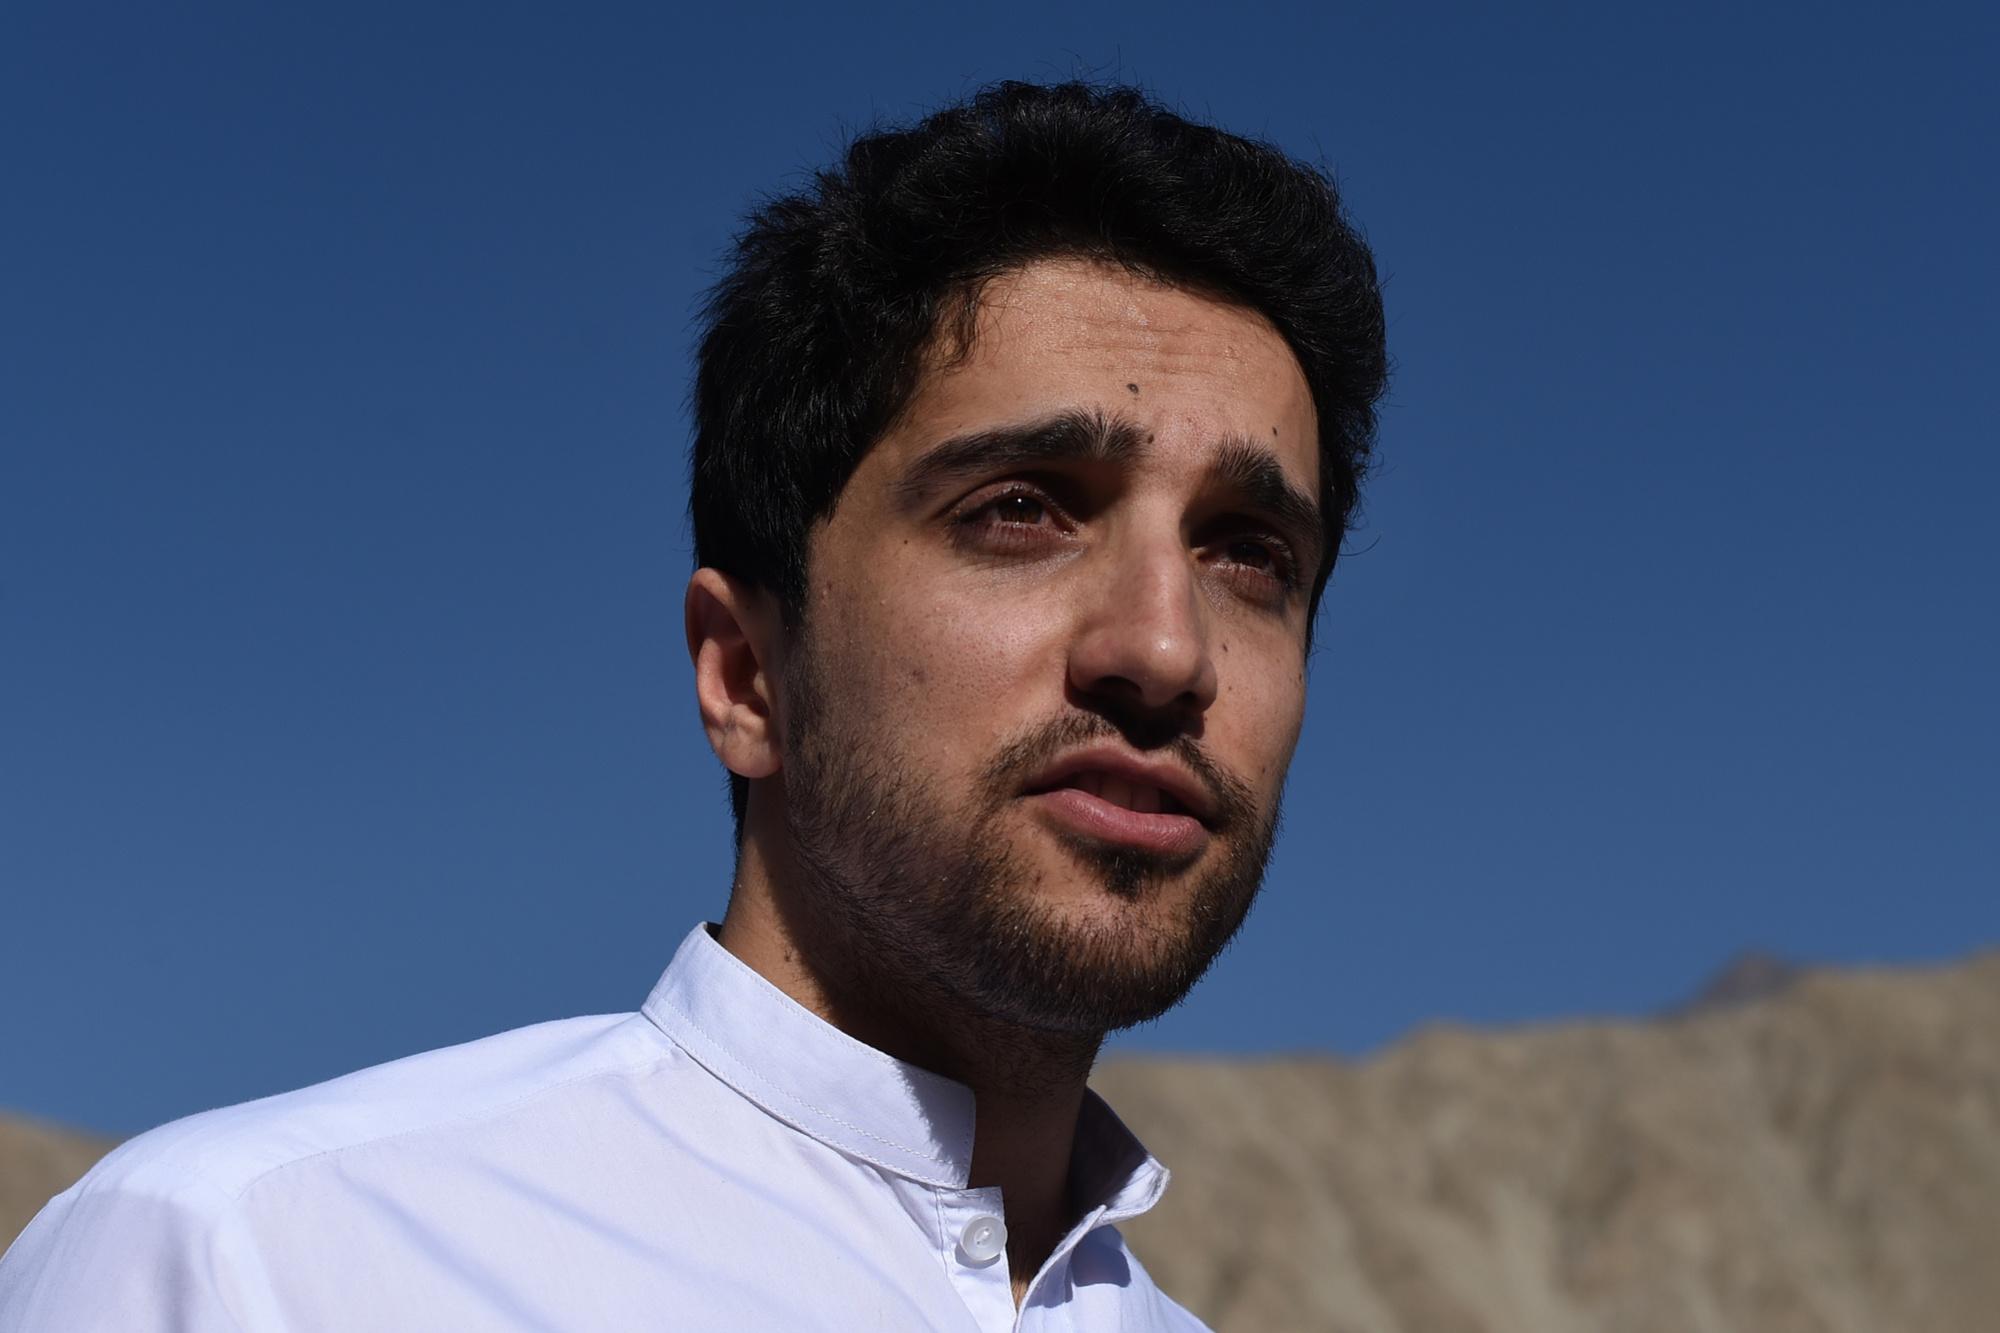 Ahmad Massoud (foto 2016), Getty